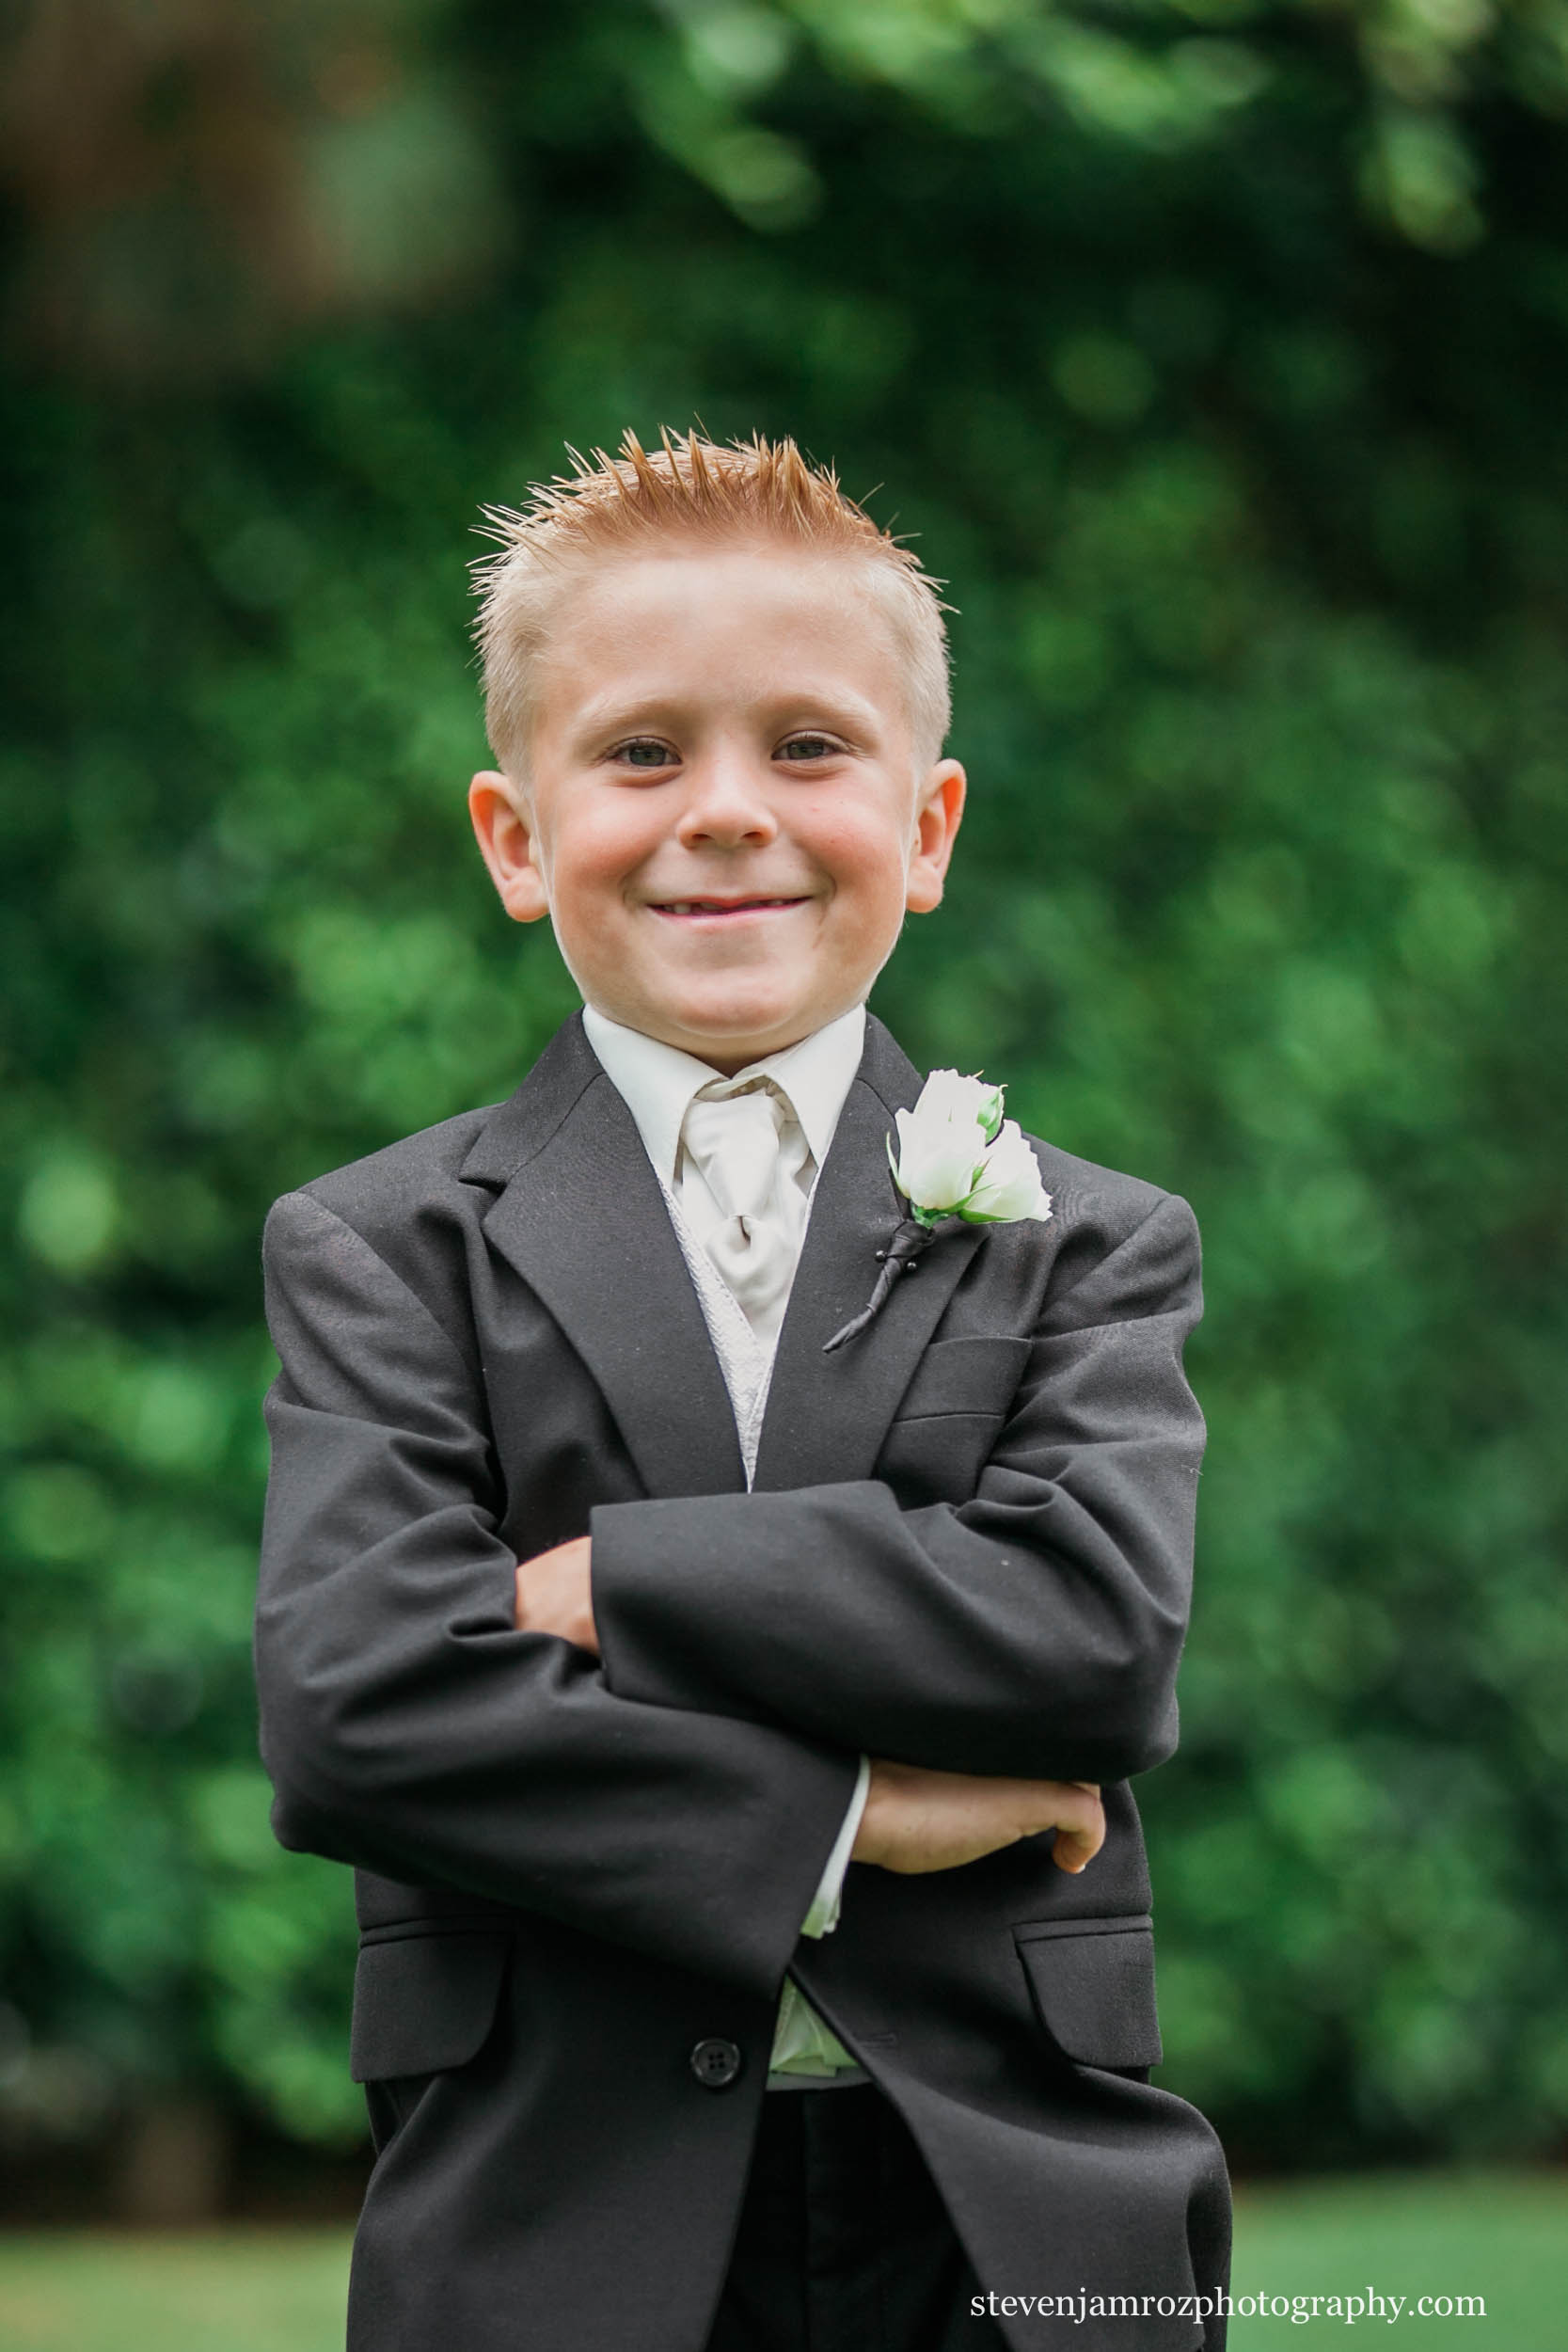 kid-wedding-portrait-raleigh-nc-steven-jamroz-photography-0351.jpg